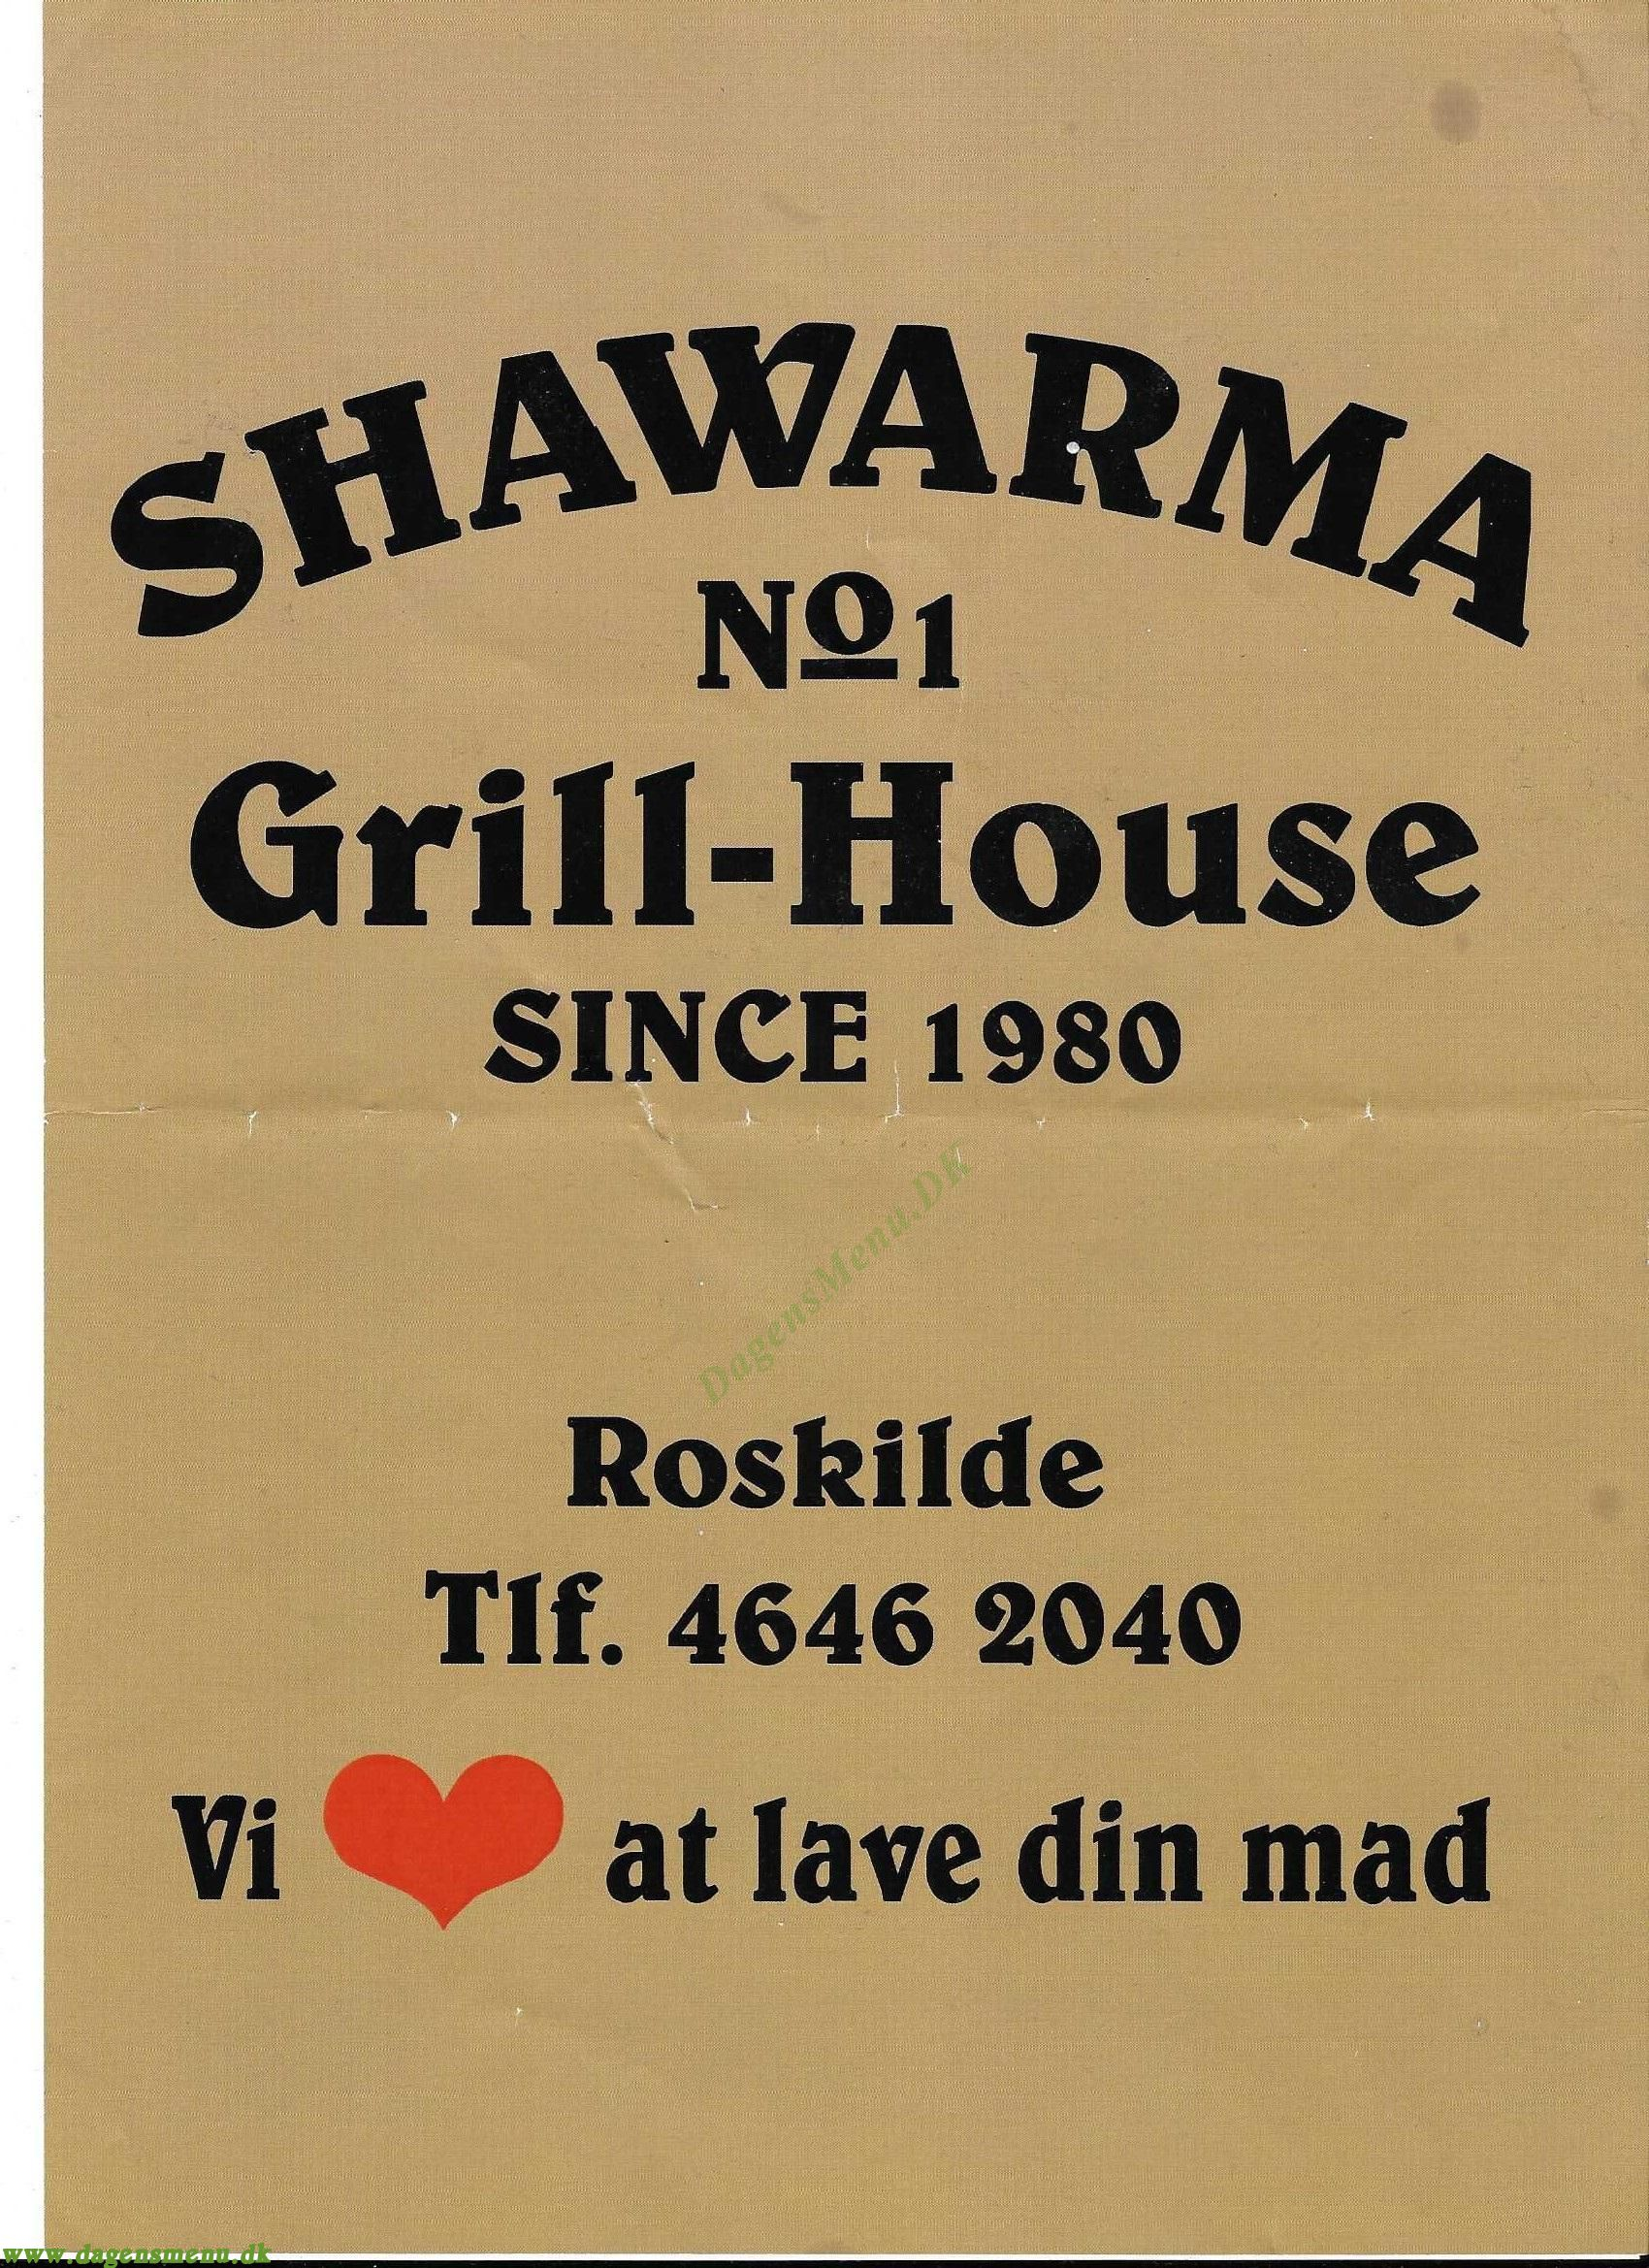 Shawarma Grill-House - Menukort